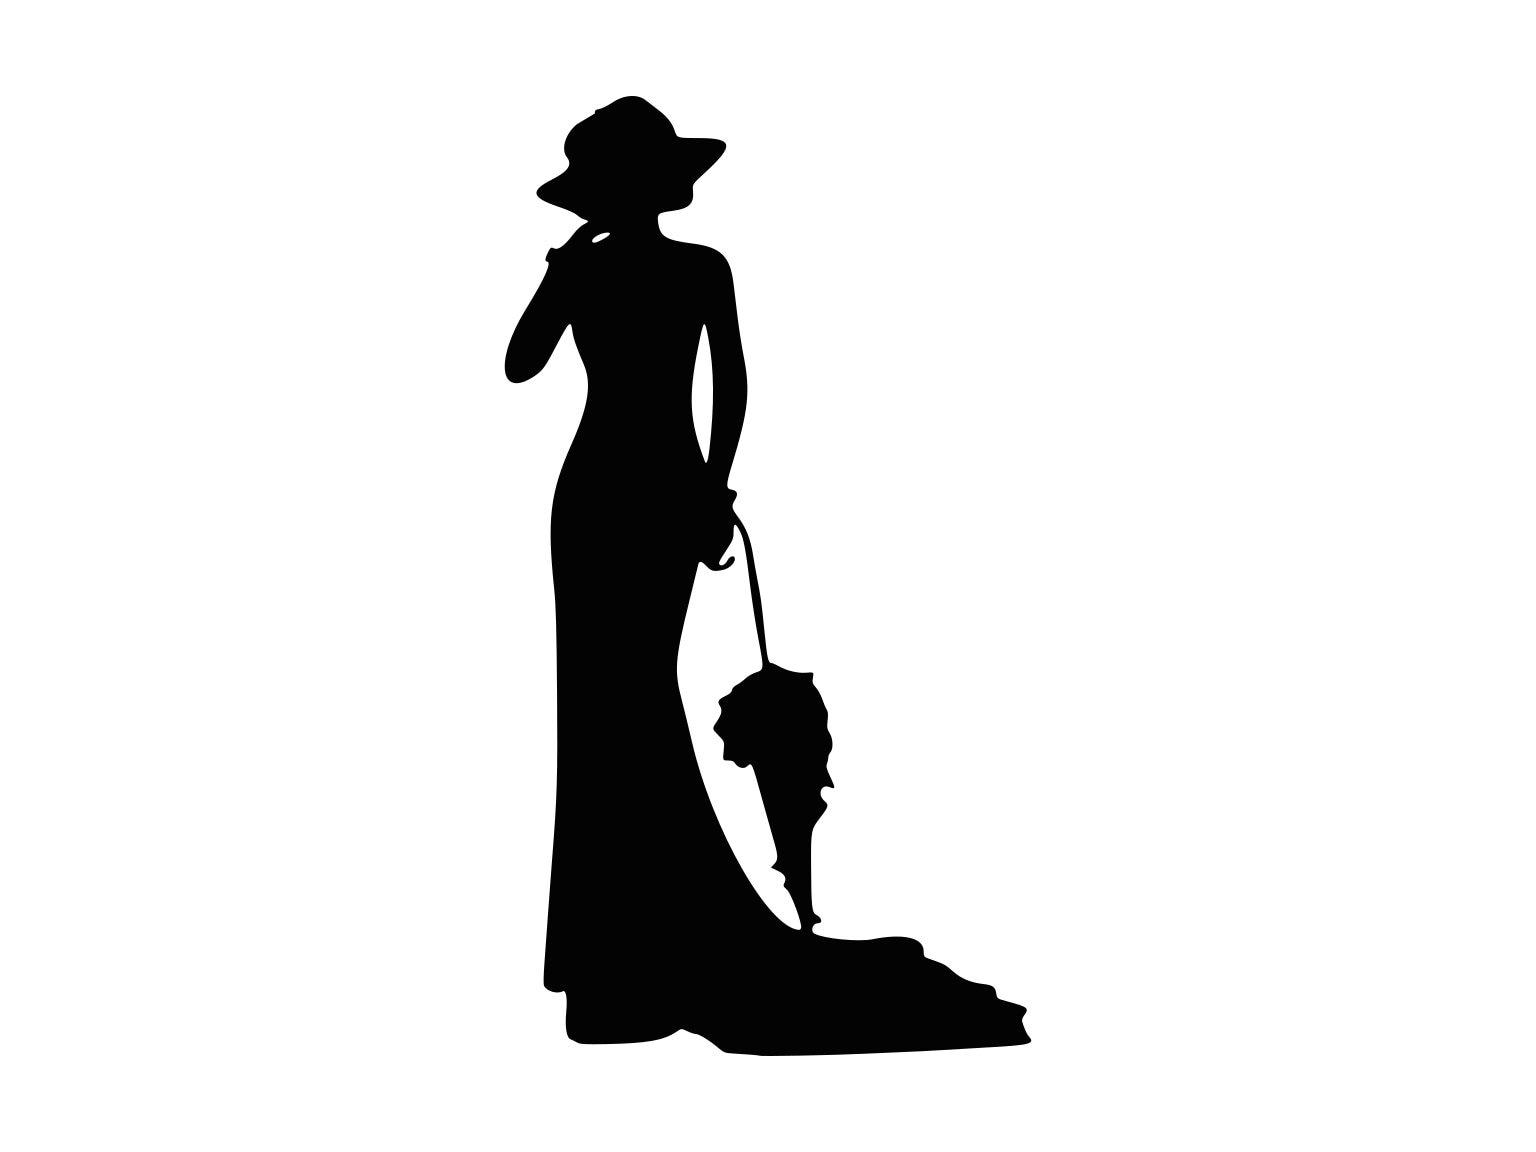 Vintage Lady Svg Elegant Lady Svg Lady Silhouette Cutting